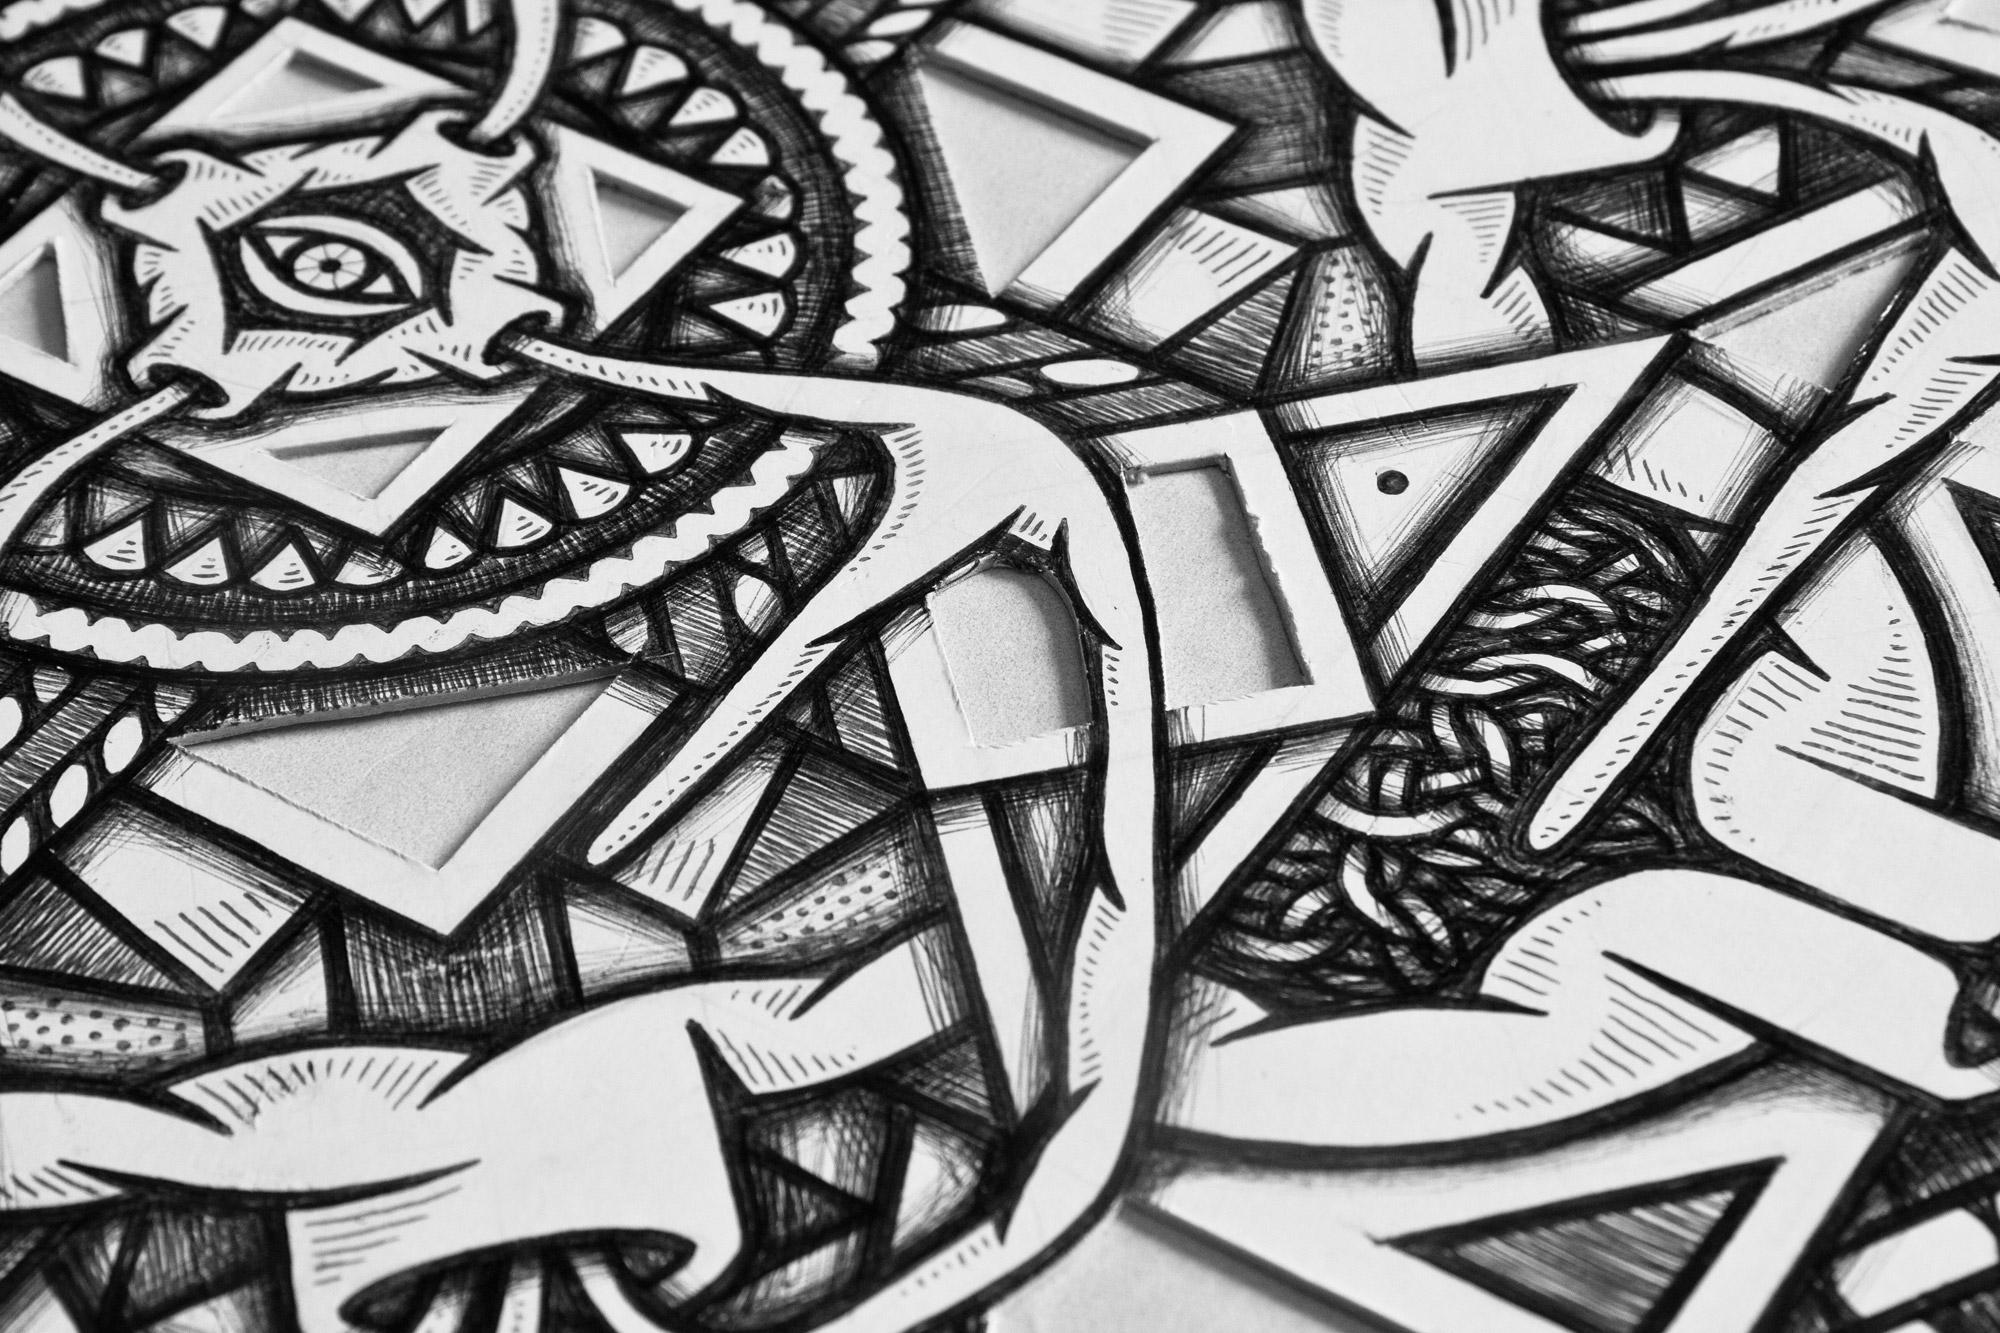 mandala-intero-cutting-pen-detail3